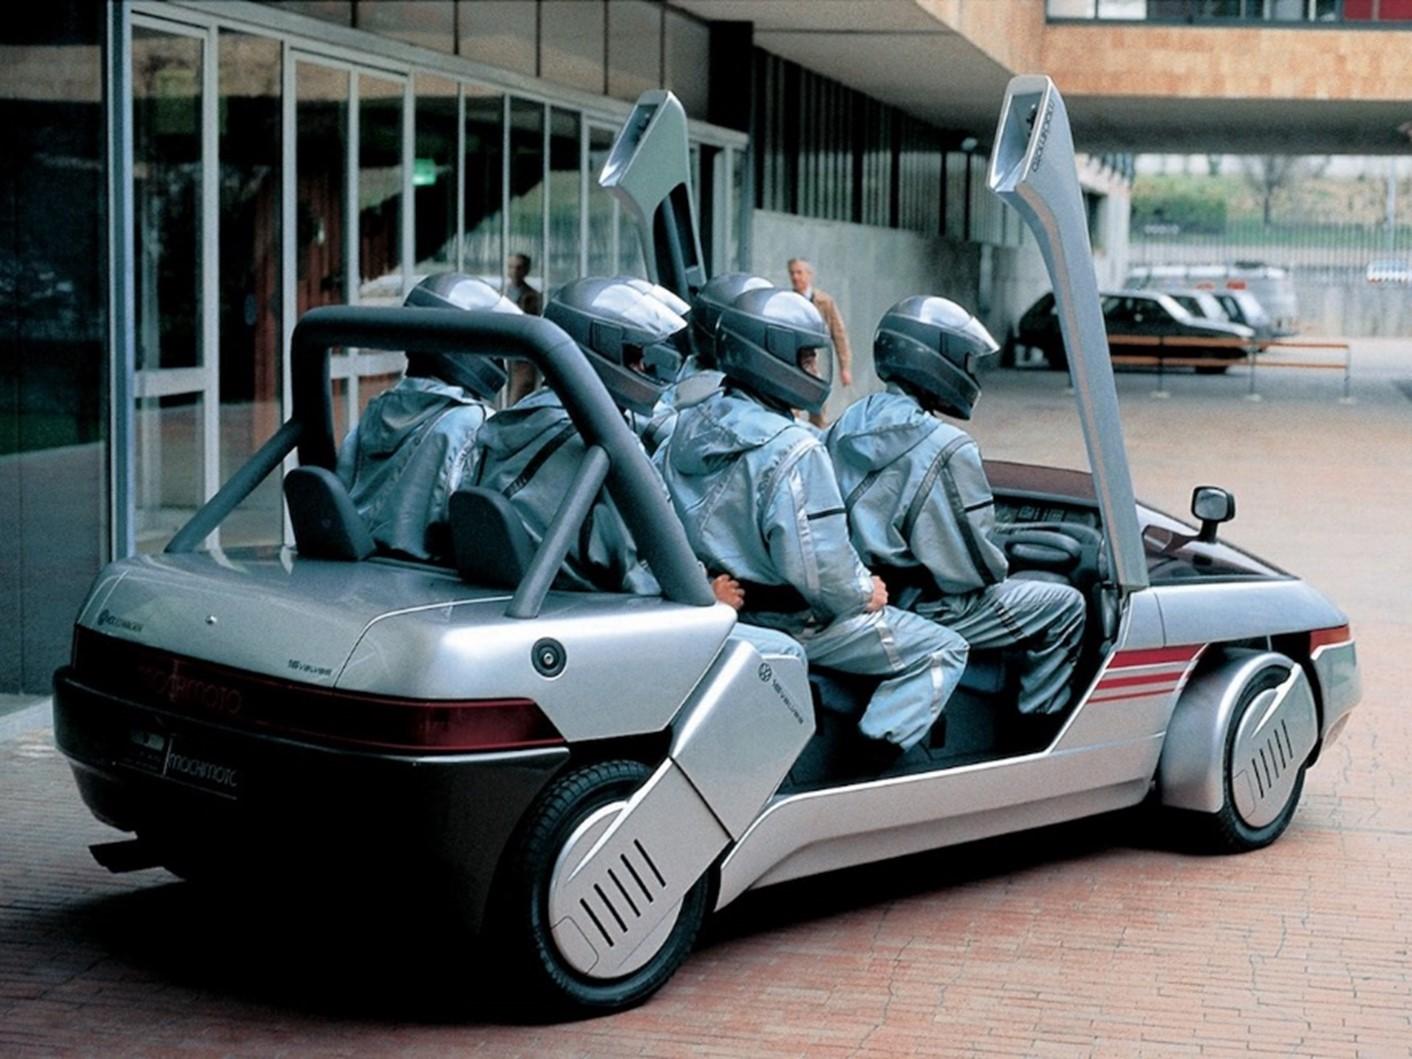 The Italdesign Machimoto VW concept